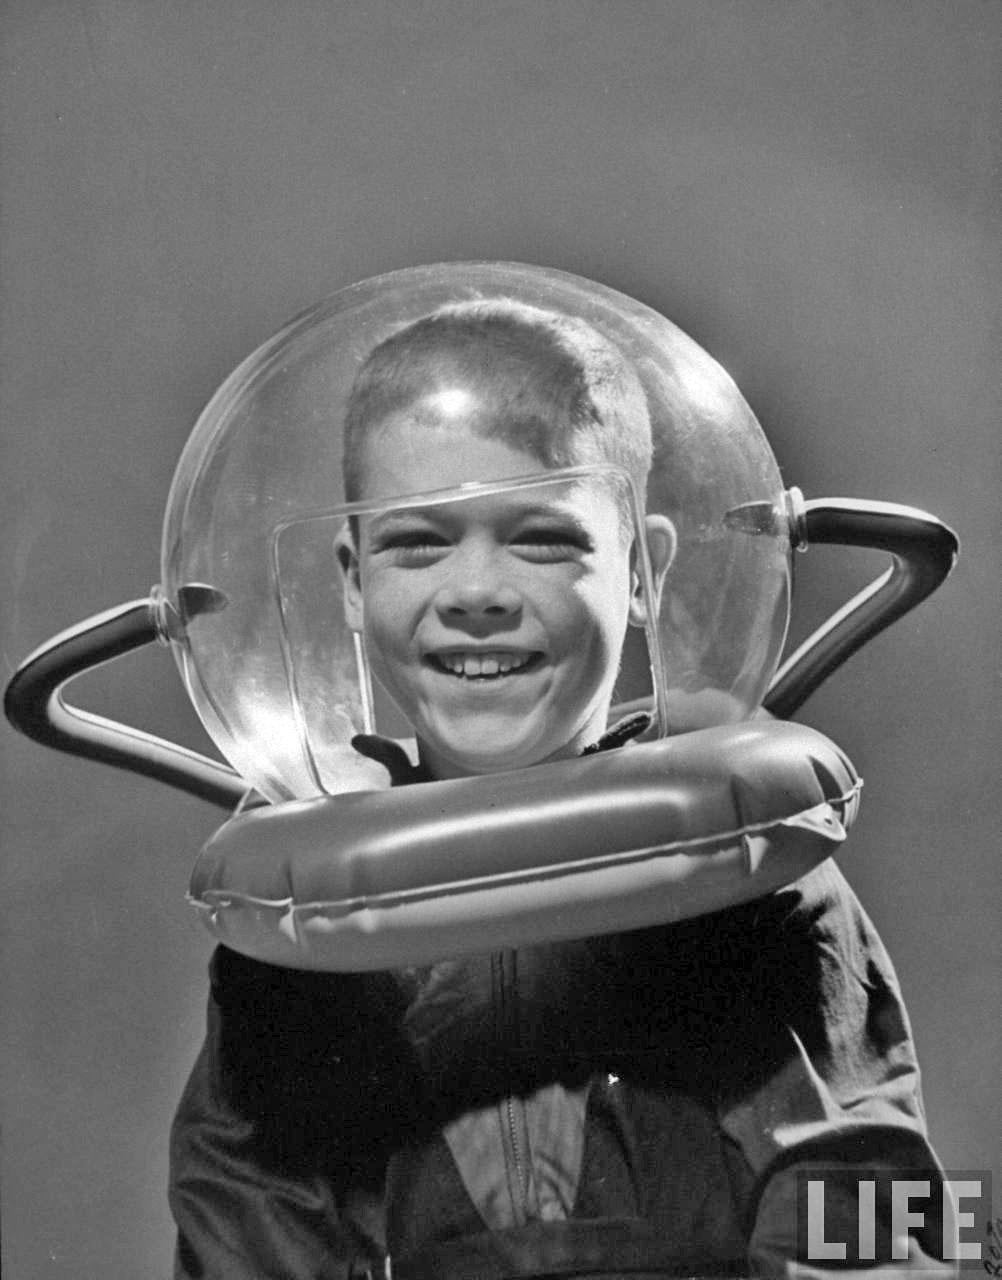 Rocket Ship Prize boy with space helmet